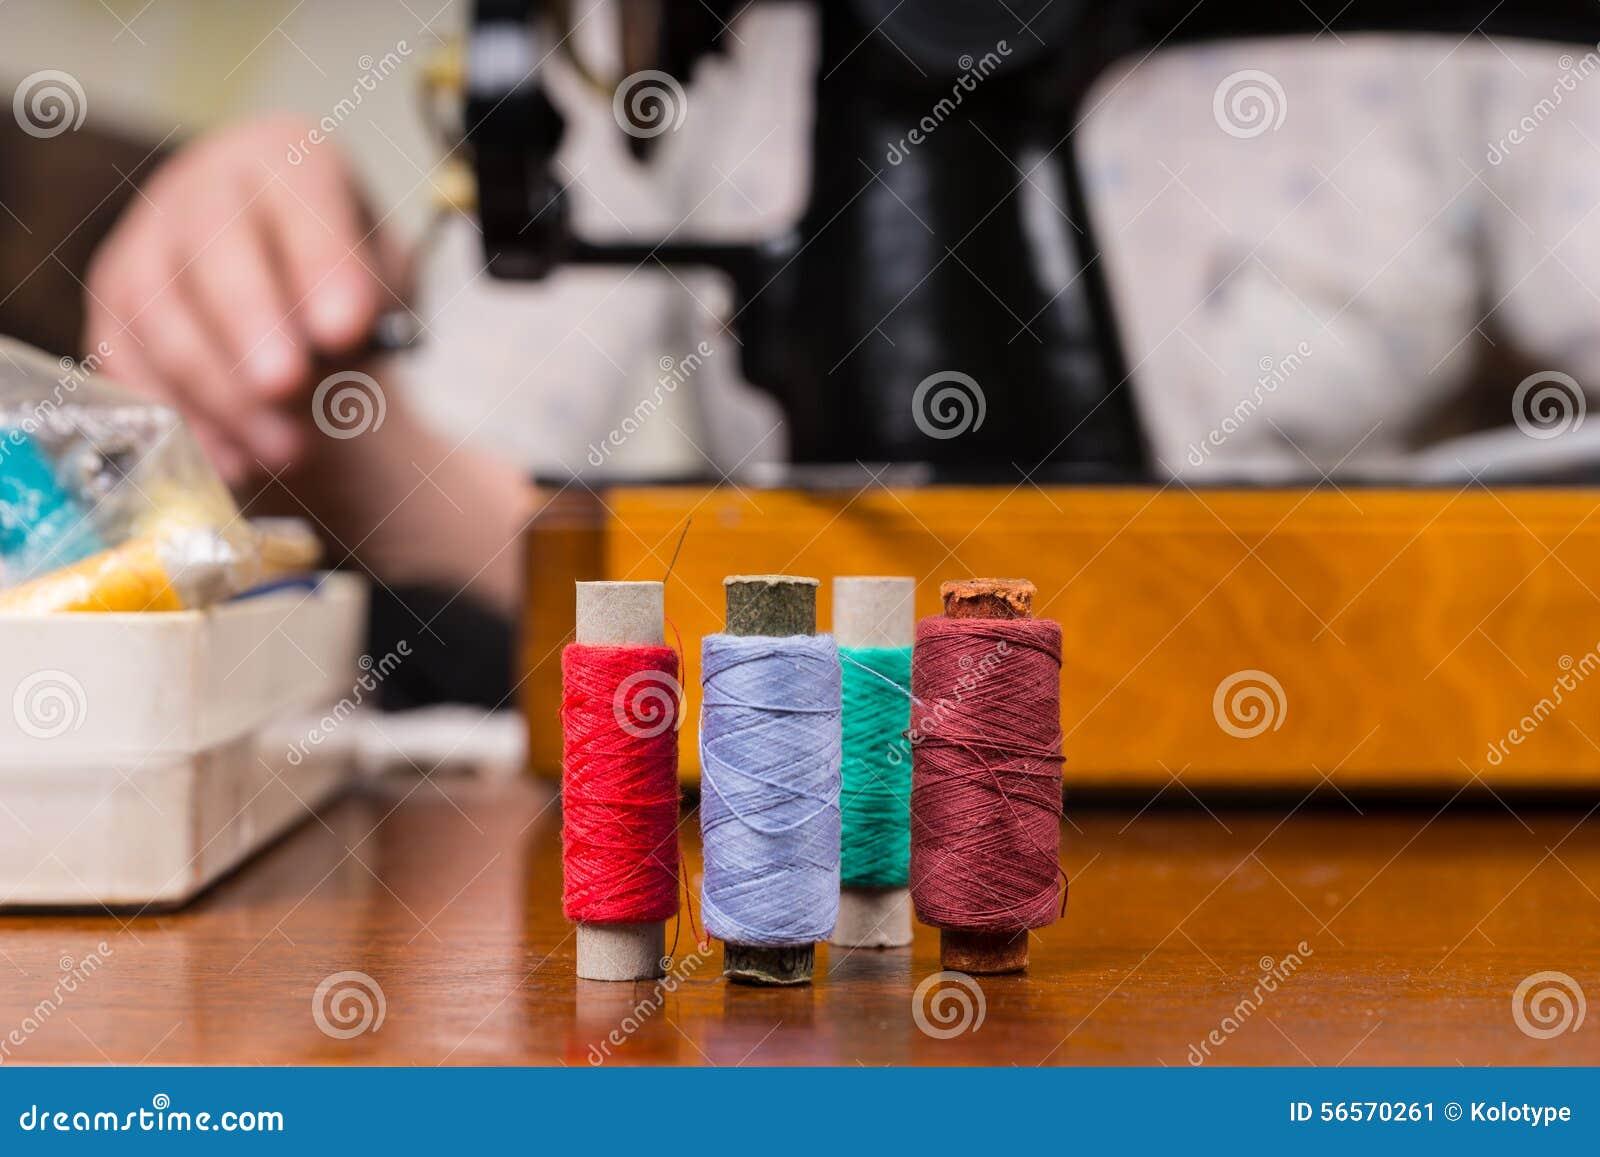 Download Στροφία του νήματος στον πίνακα από τη ράβοντας μηχανή Στοκ Εικόνα - εικόνα από βακκινίων, μικροδουλειά: 56570261